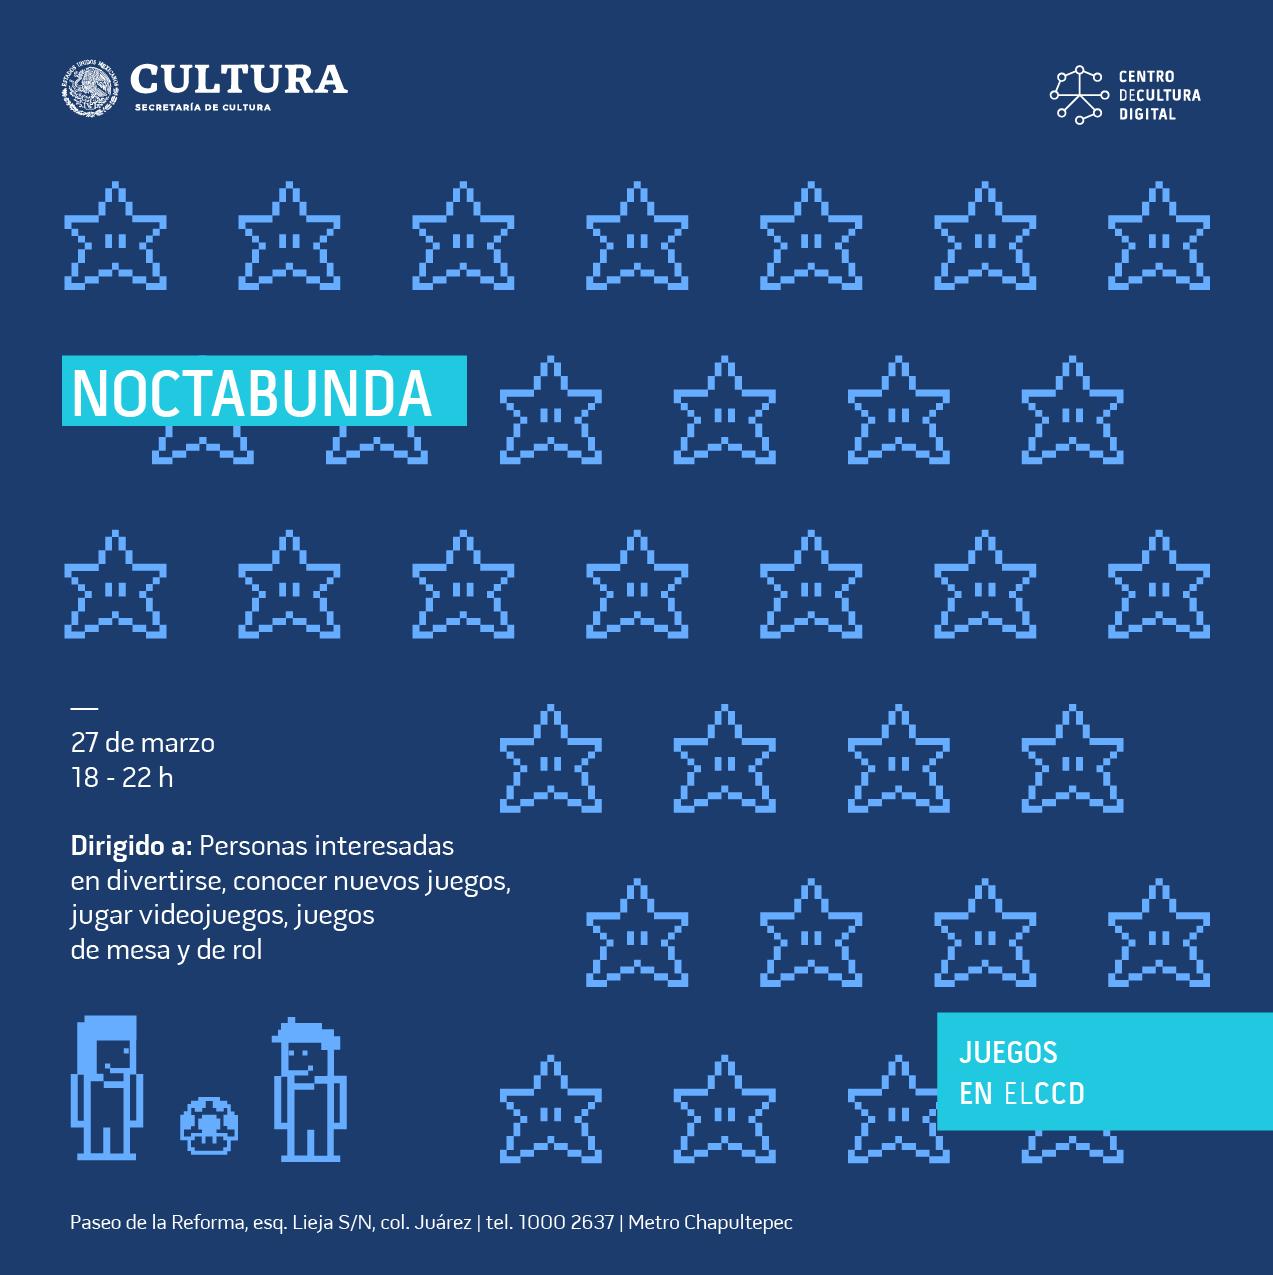 Noctabunda